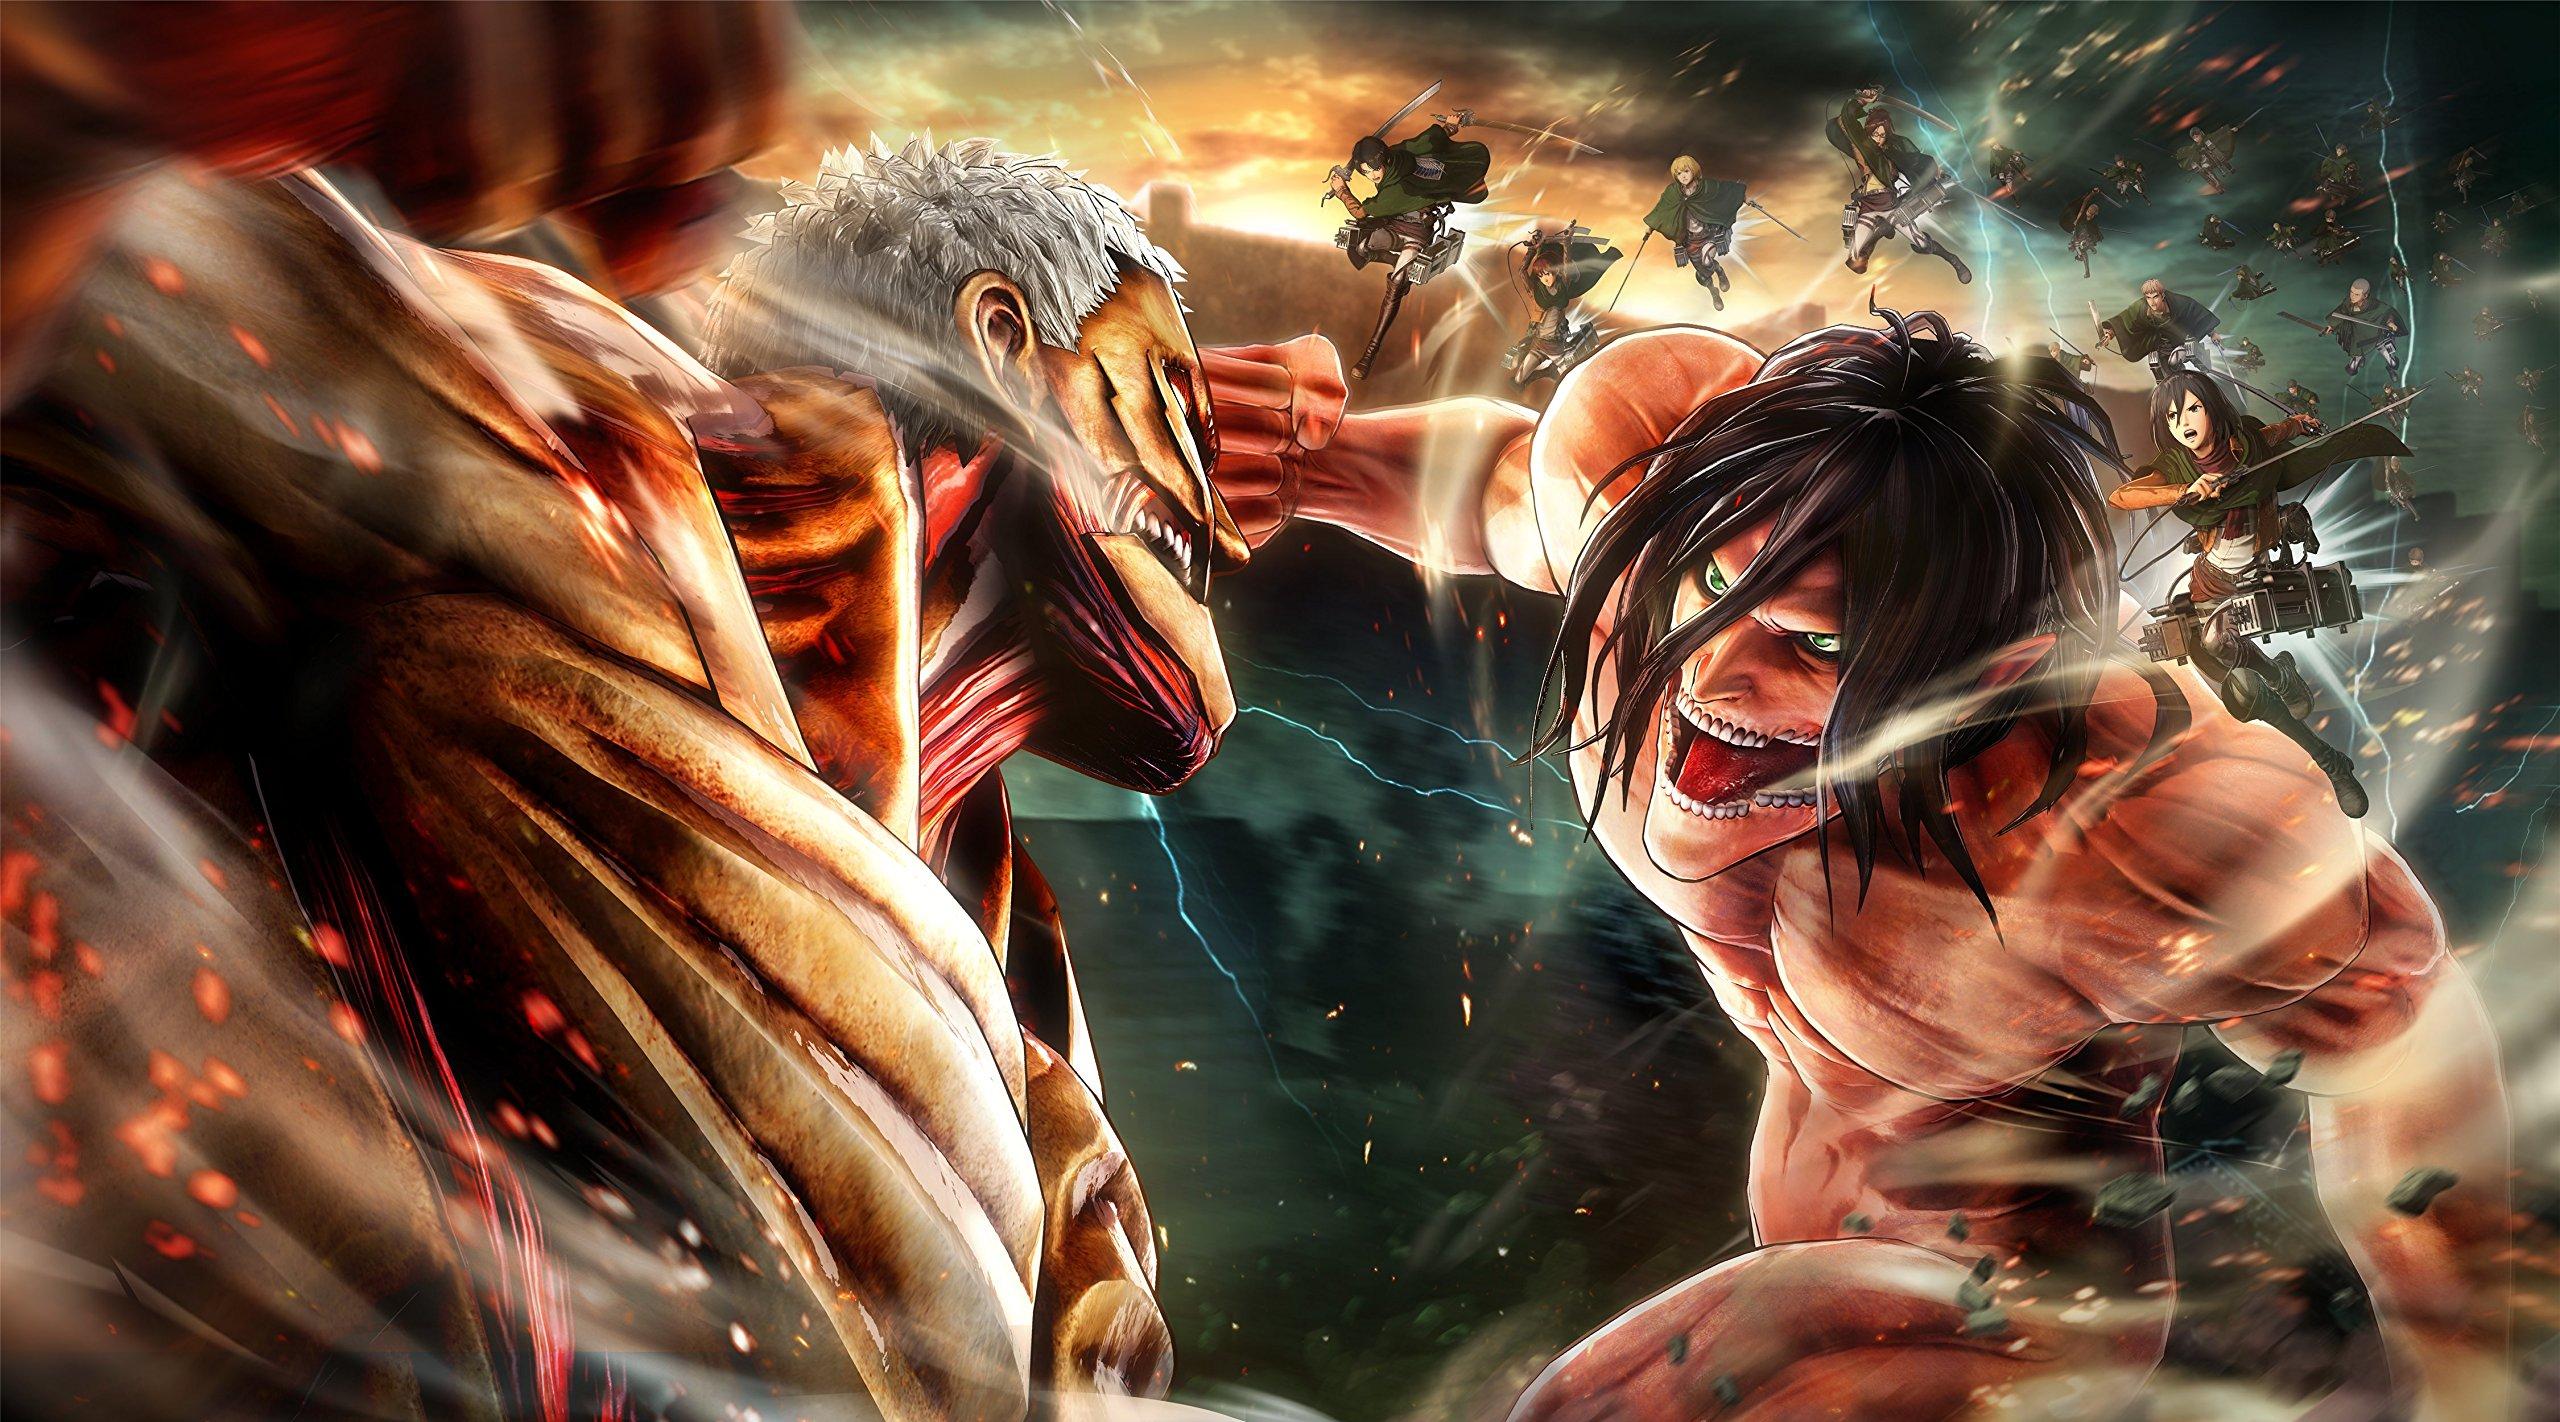 Amazon Attack On Titan 2